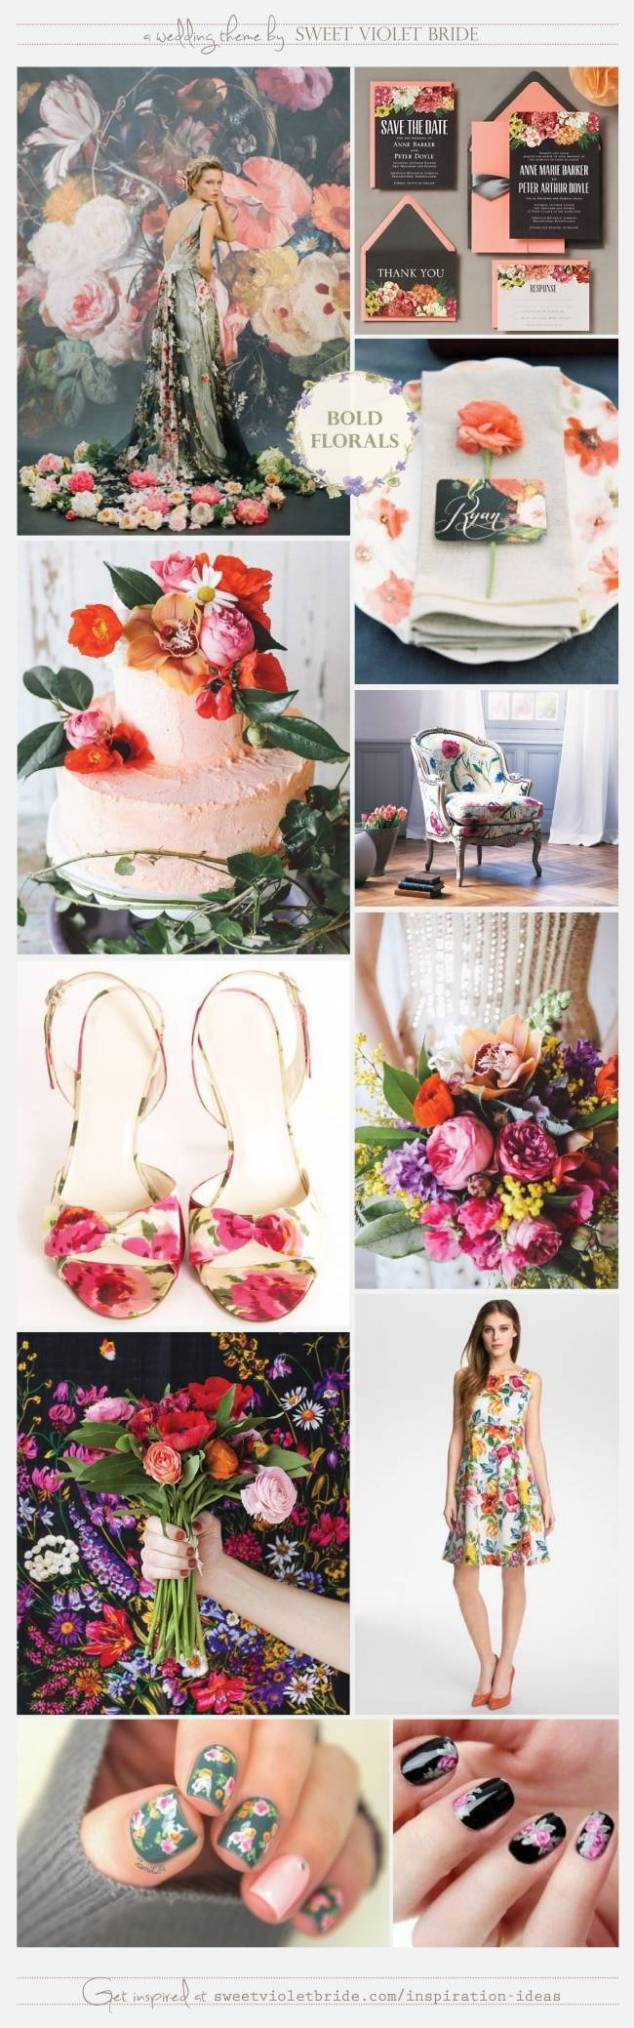 Wedding Inspiration Board #21: Bold Florals